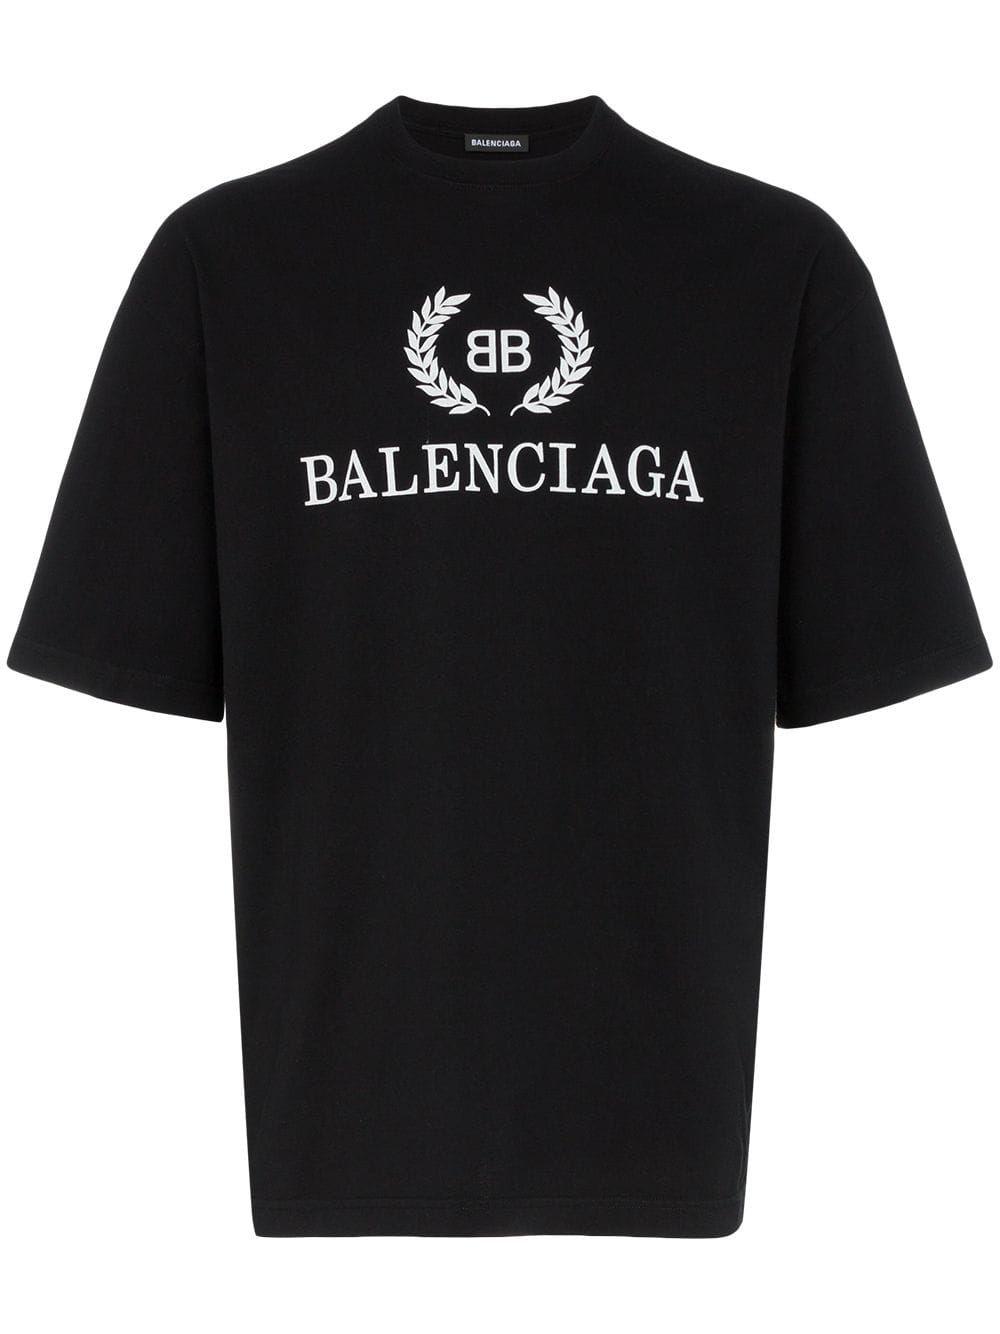 44++ Balenciaga t shirt men ideas ideas in 2021